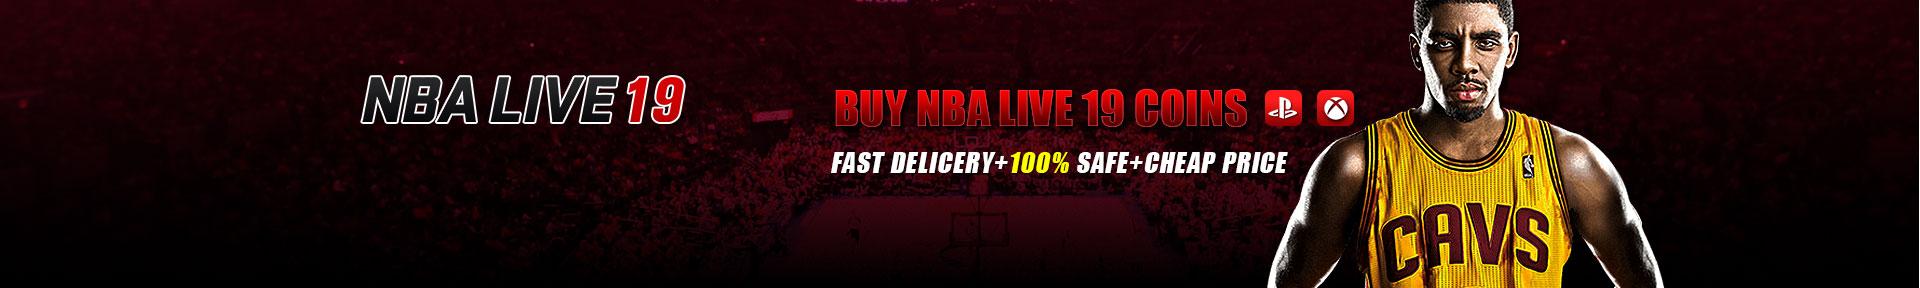 NBA Live 19 Coins